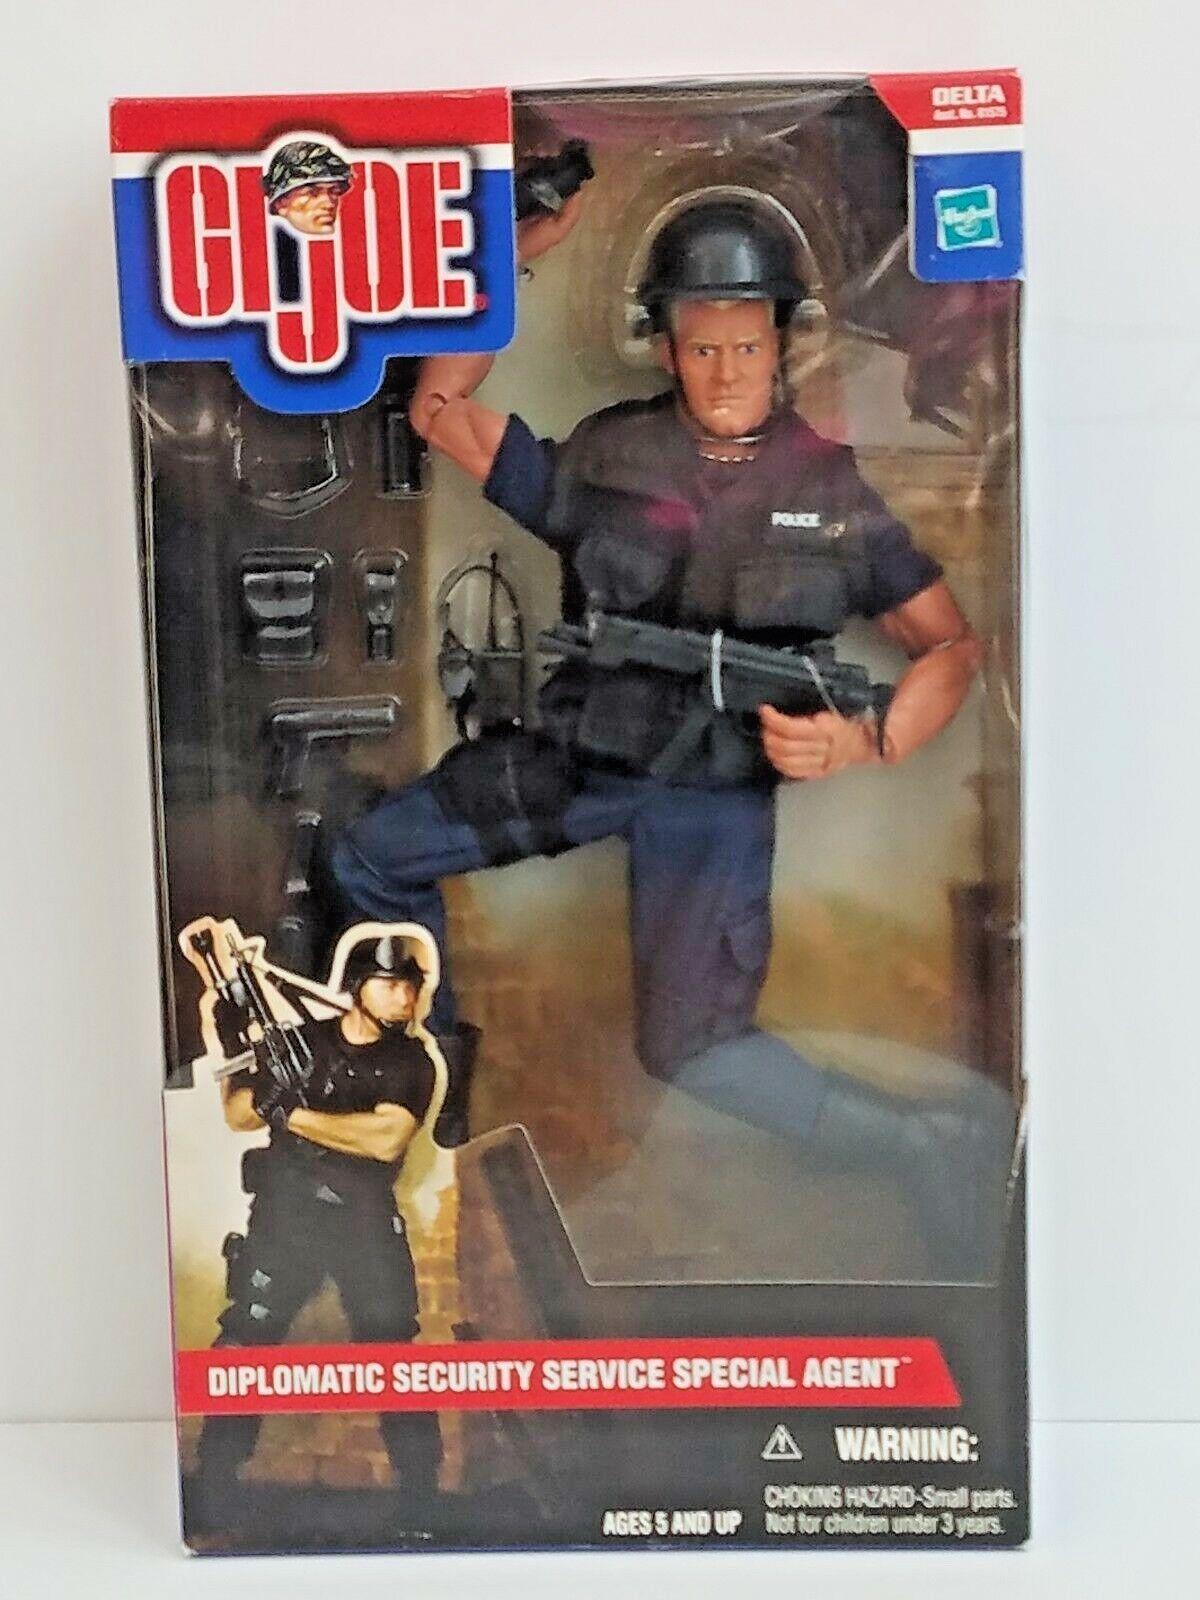 GI Joe Diplomat Security Service Special Agent DSS 2001 Hasbro Action Figure